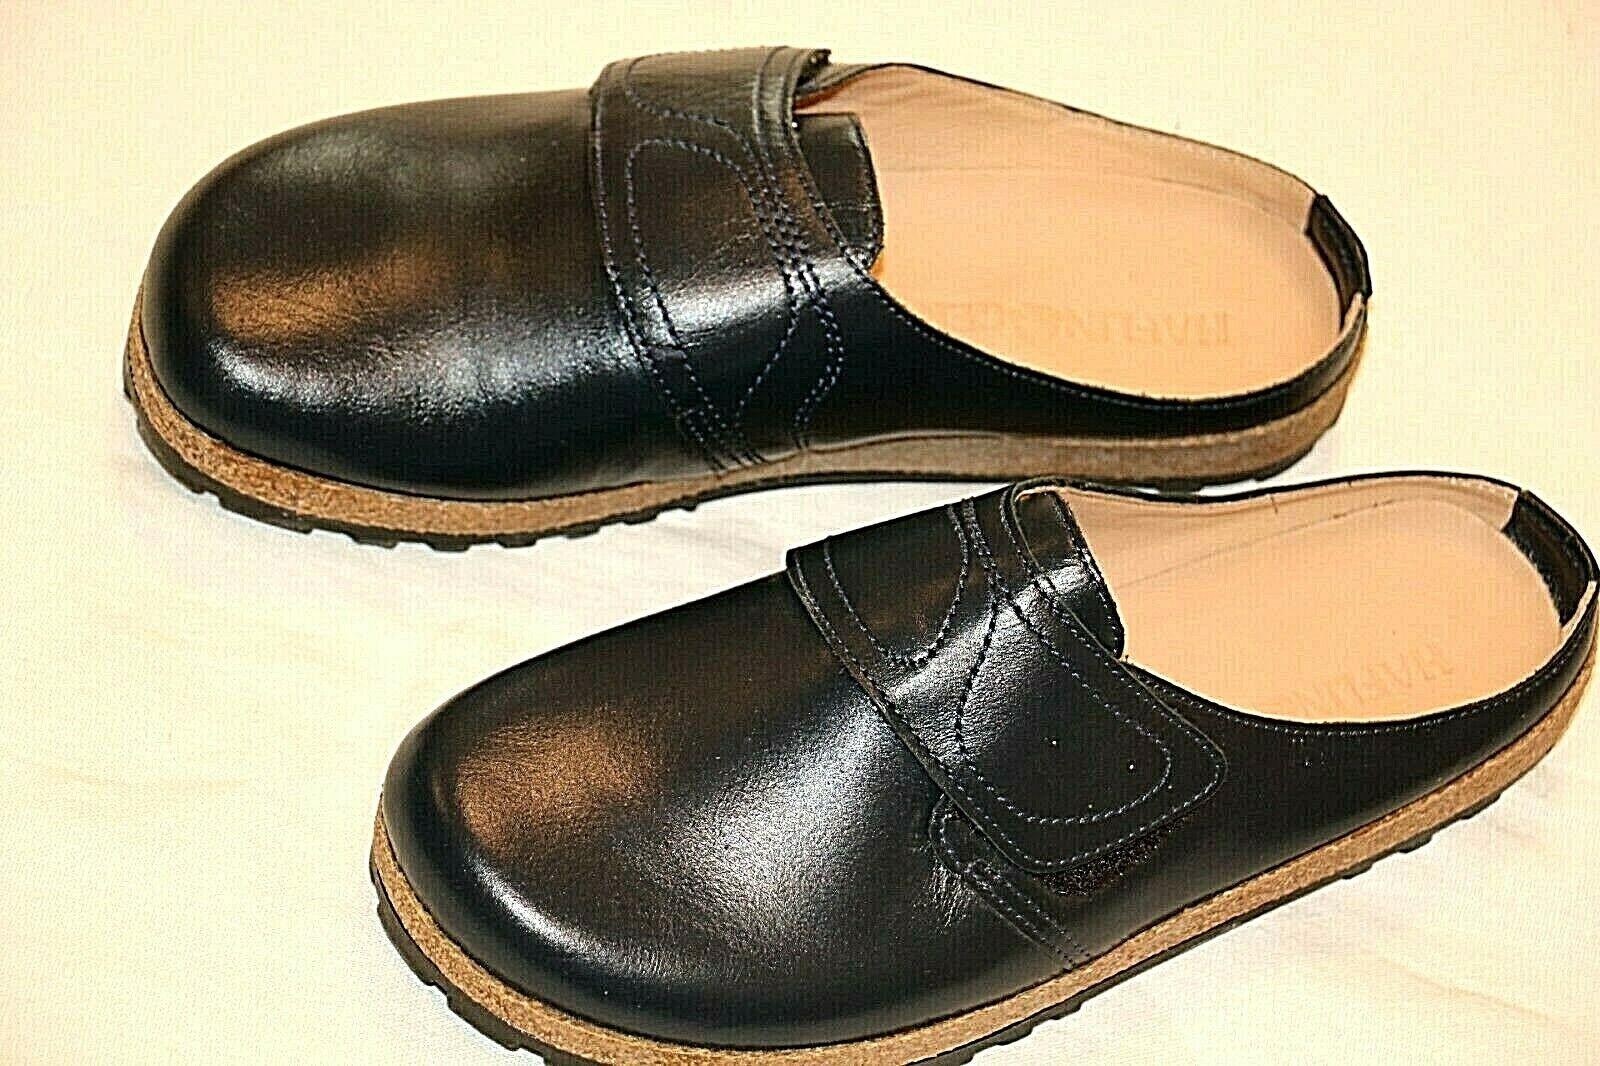 separation shoes 1821e 5519d Tolle HAFLINGER HAFLINGER HAFLINGER Bio Pantoletten Echtes ...